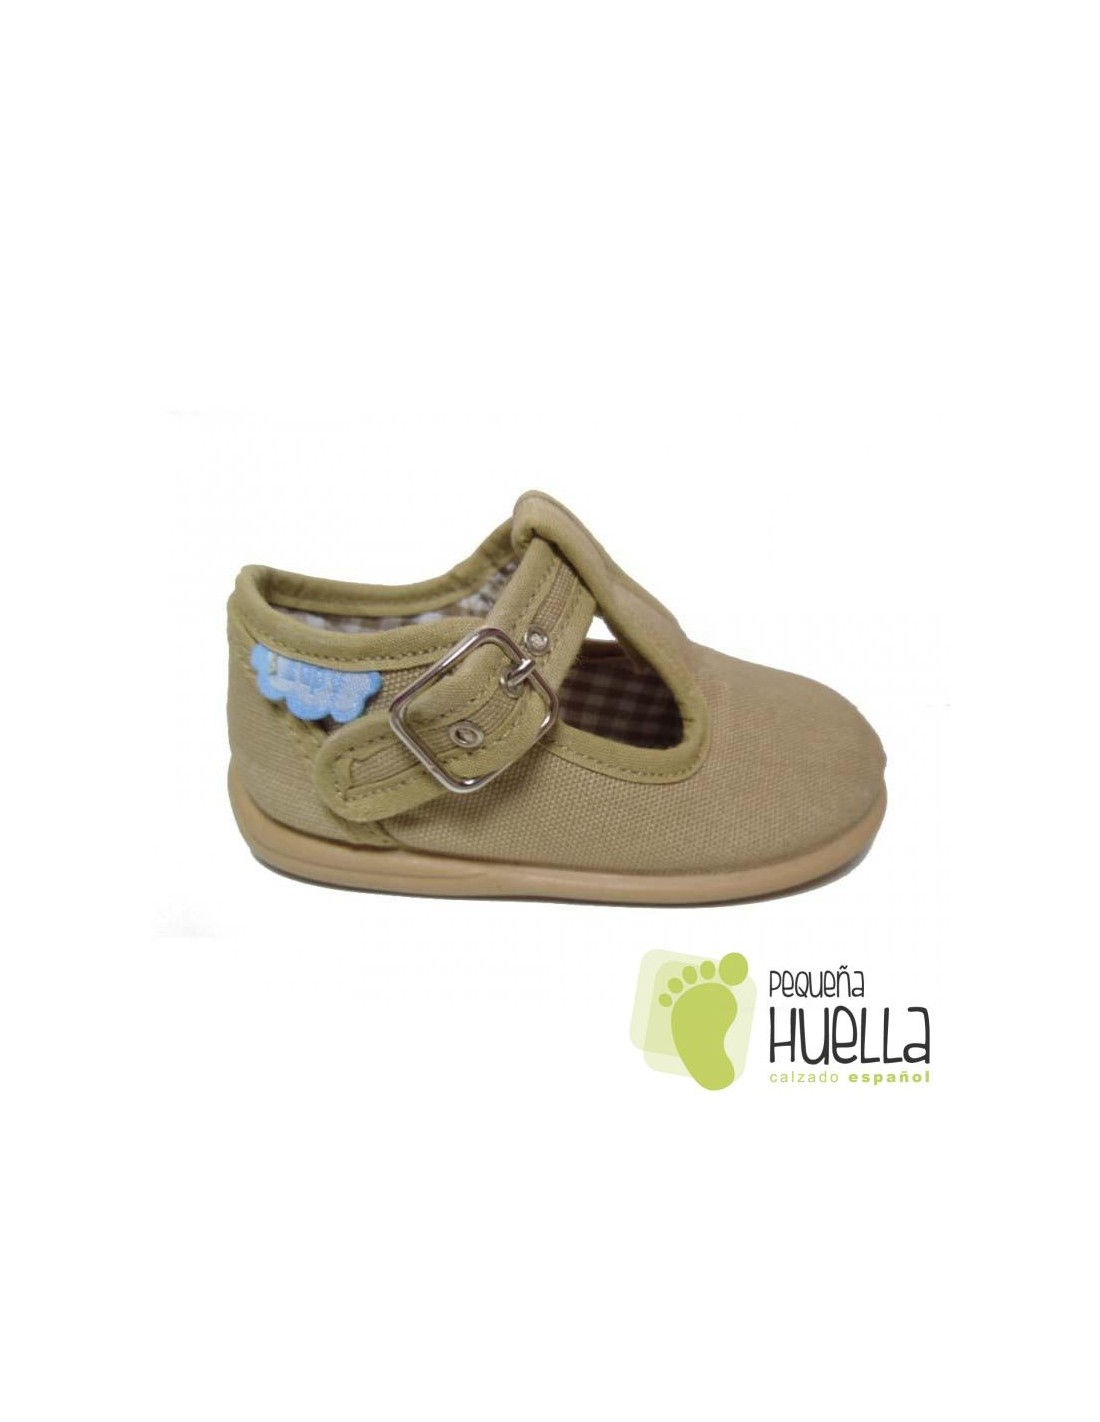 3ad6f7b0e1c ... Pepitos Sandalias zapatos de Lona beige camel marron tostado Zapy con  hebilla bebes